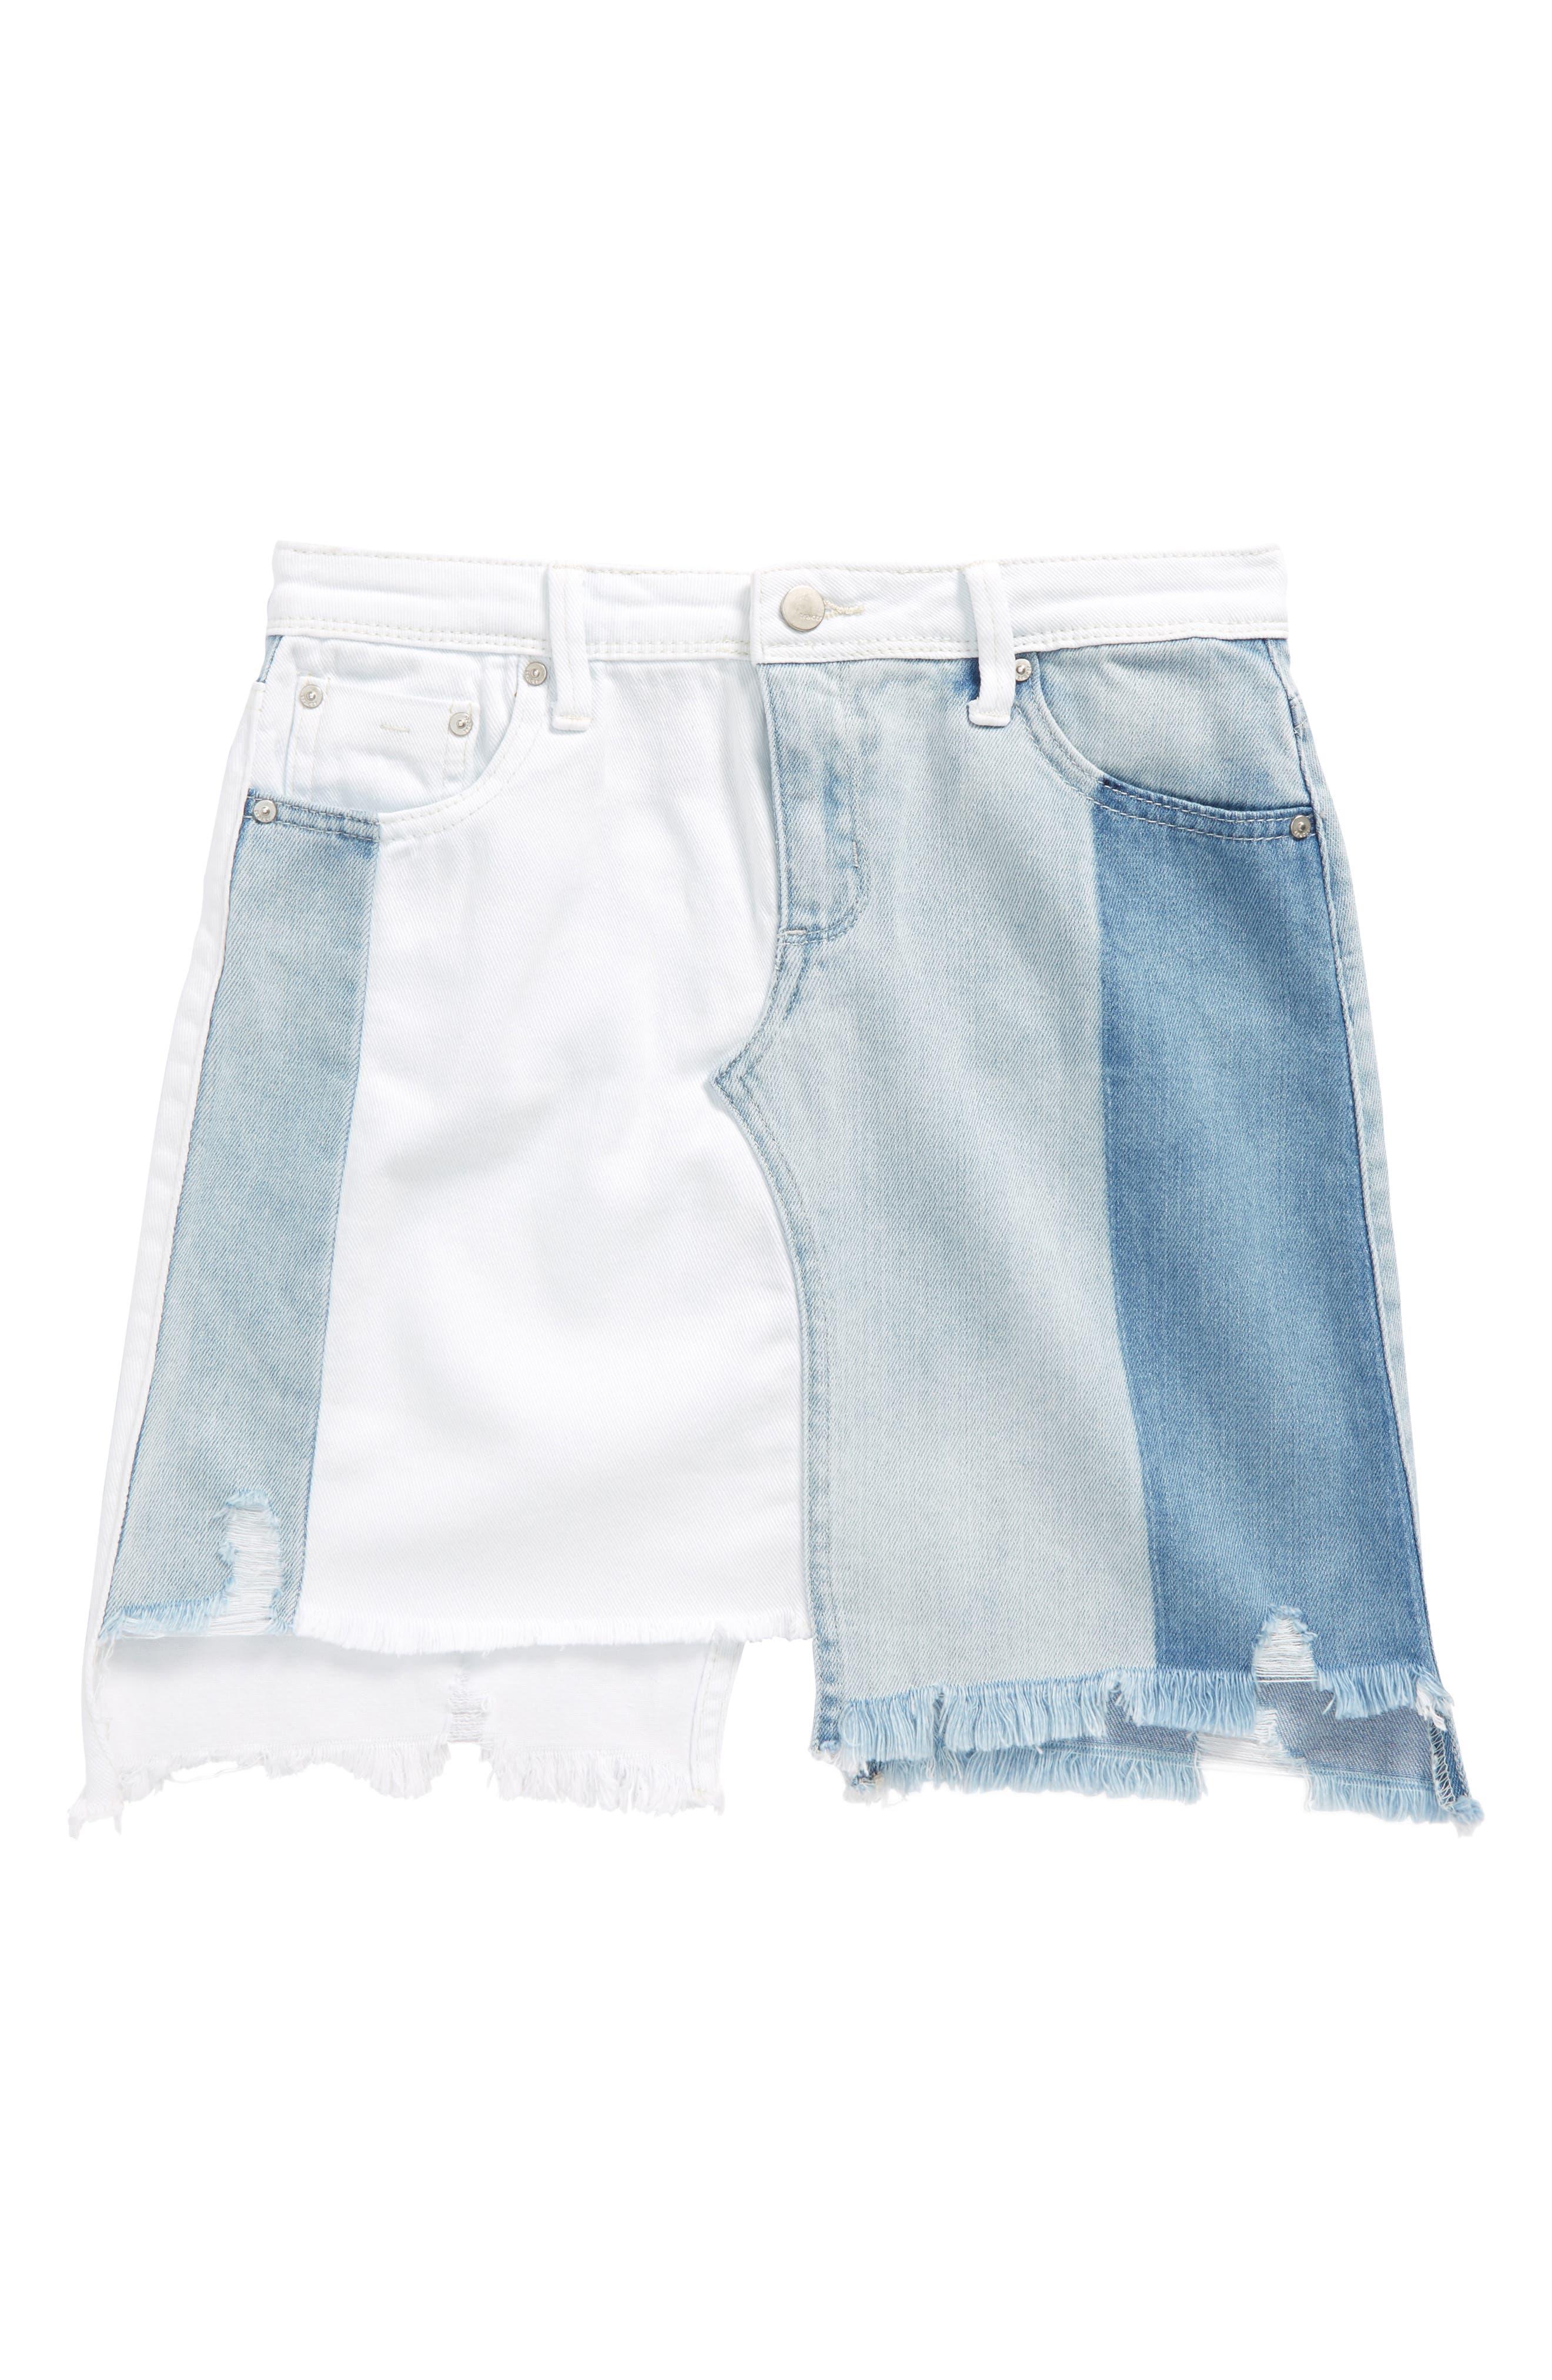 Patchwork Denim Skirt,                         Main,                         color, 100